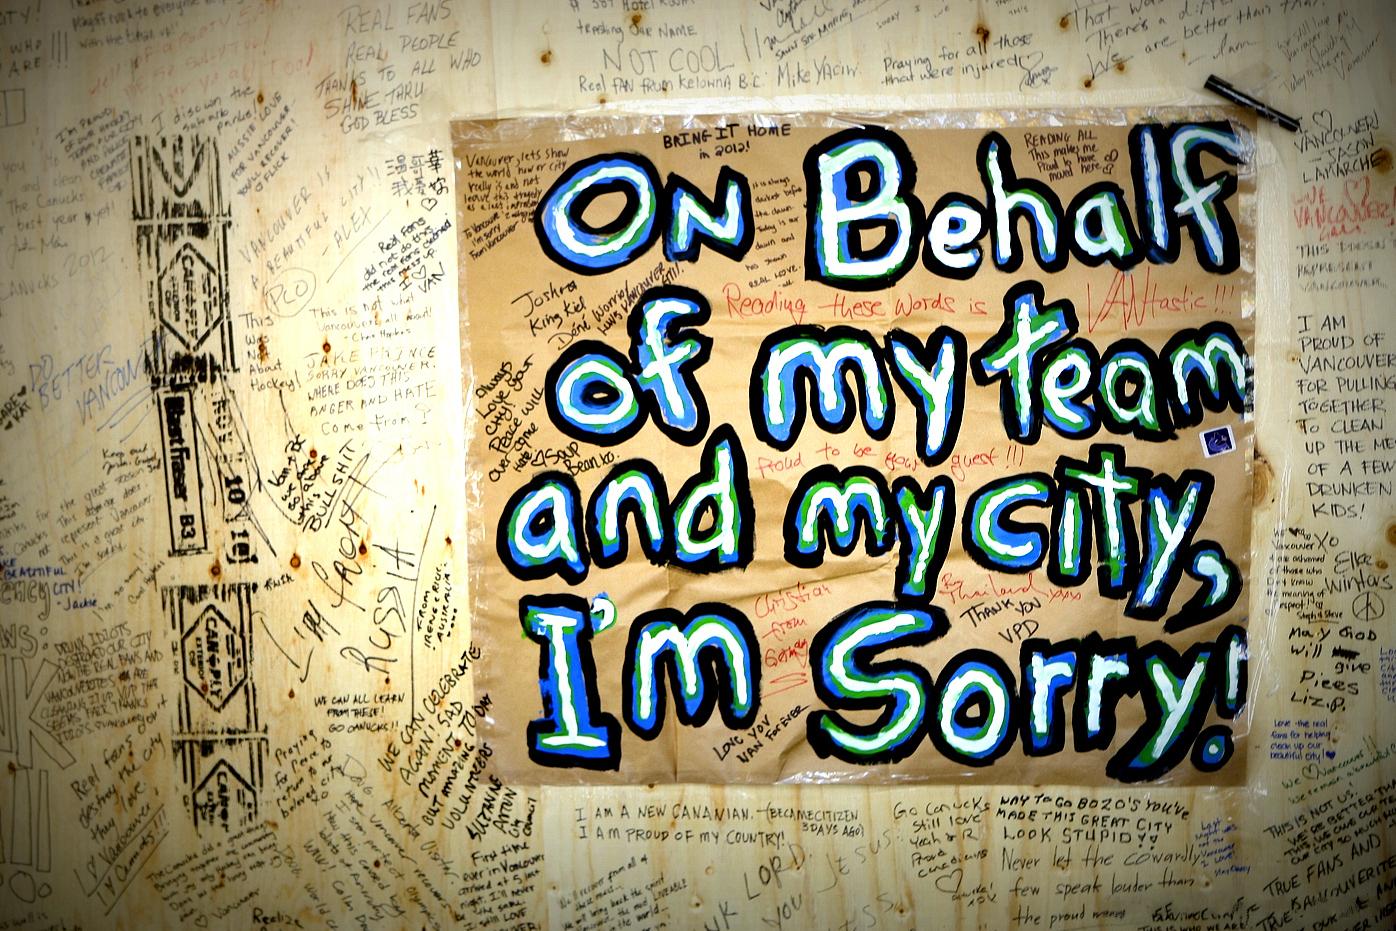 fileon behalf of my team and my city im sorryjpg